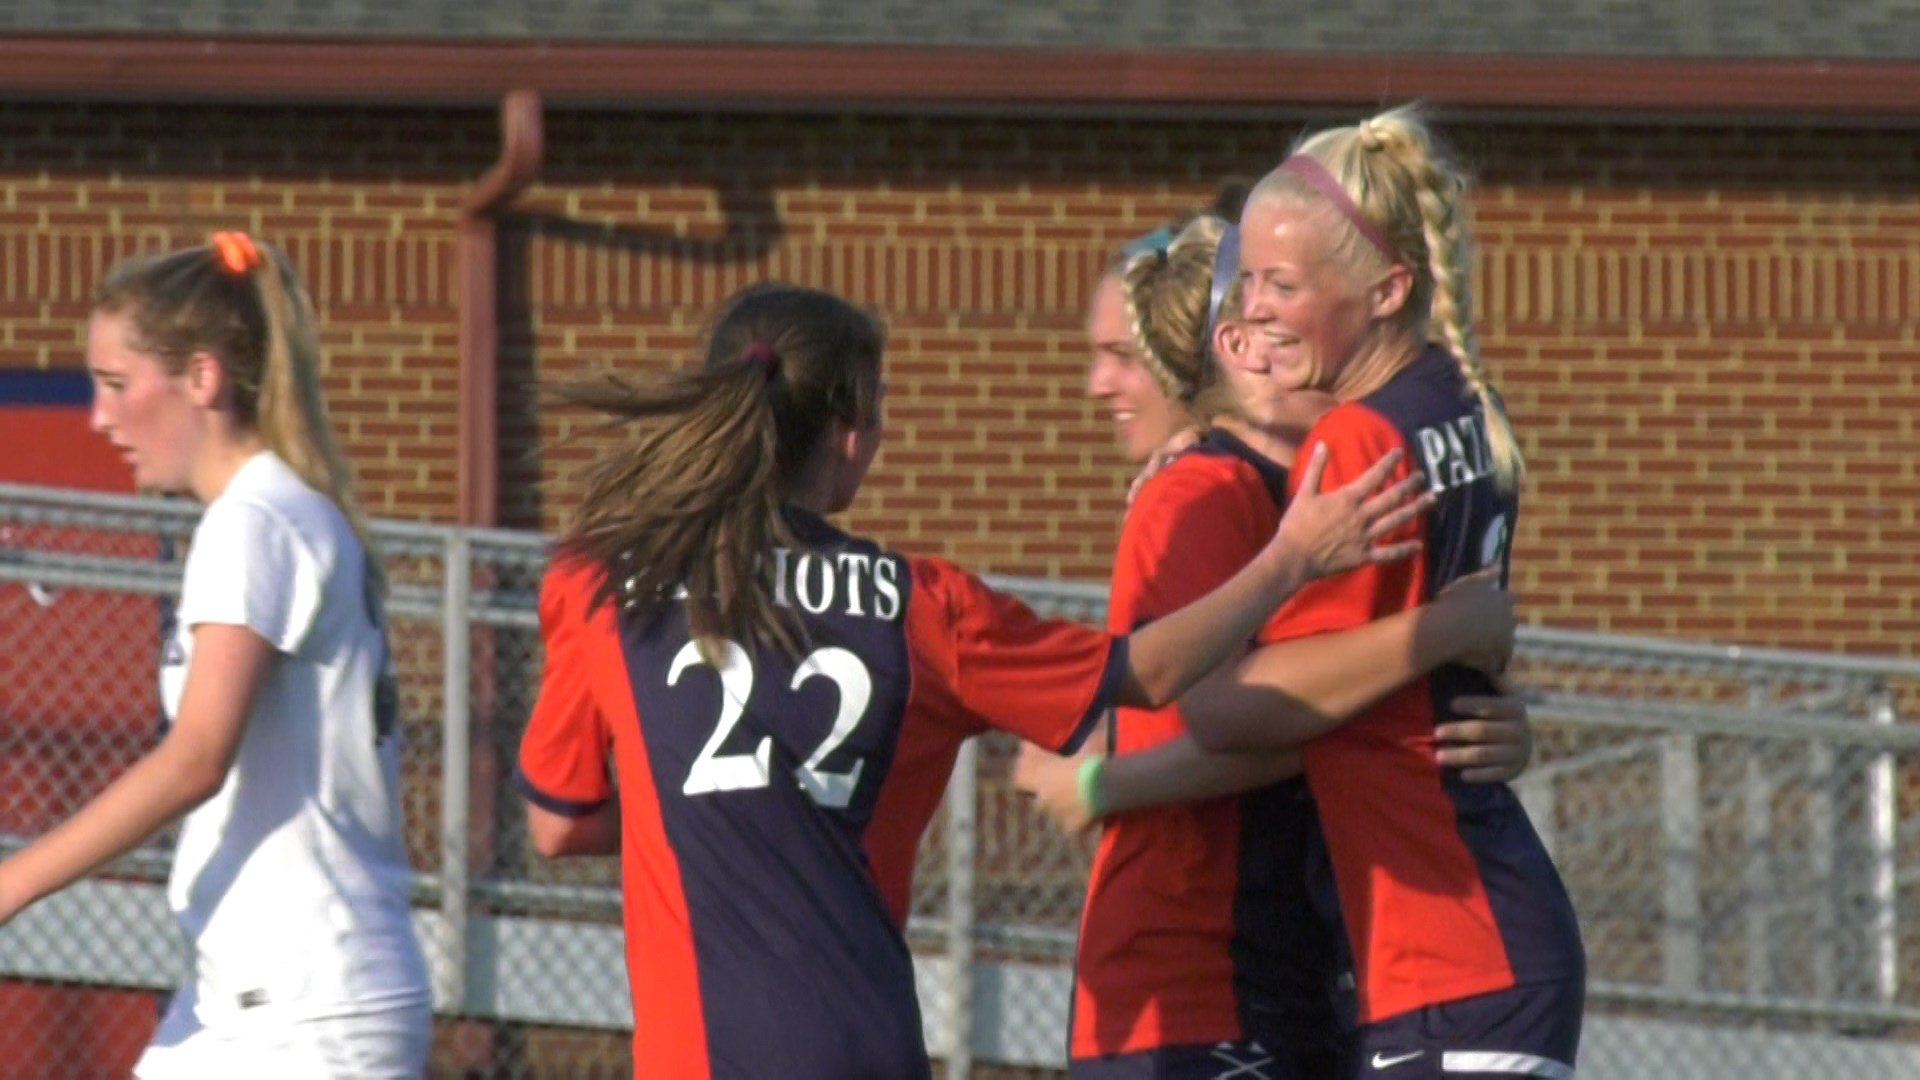 Thursday's High School Sports Scores Highlights